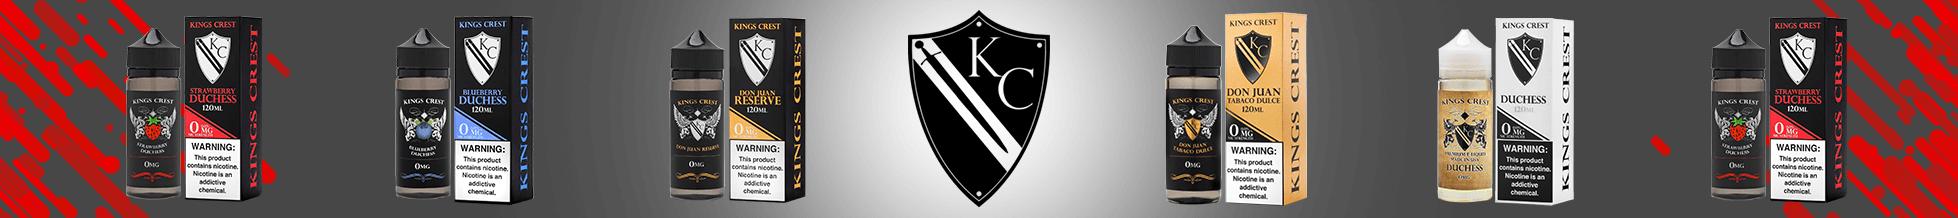 kings-crest-banner.png